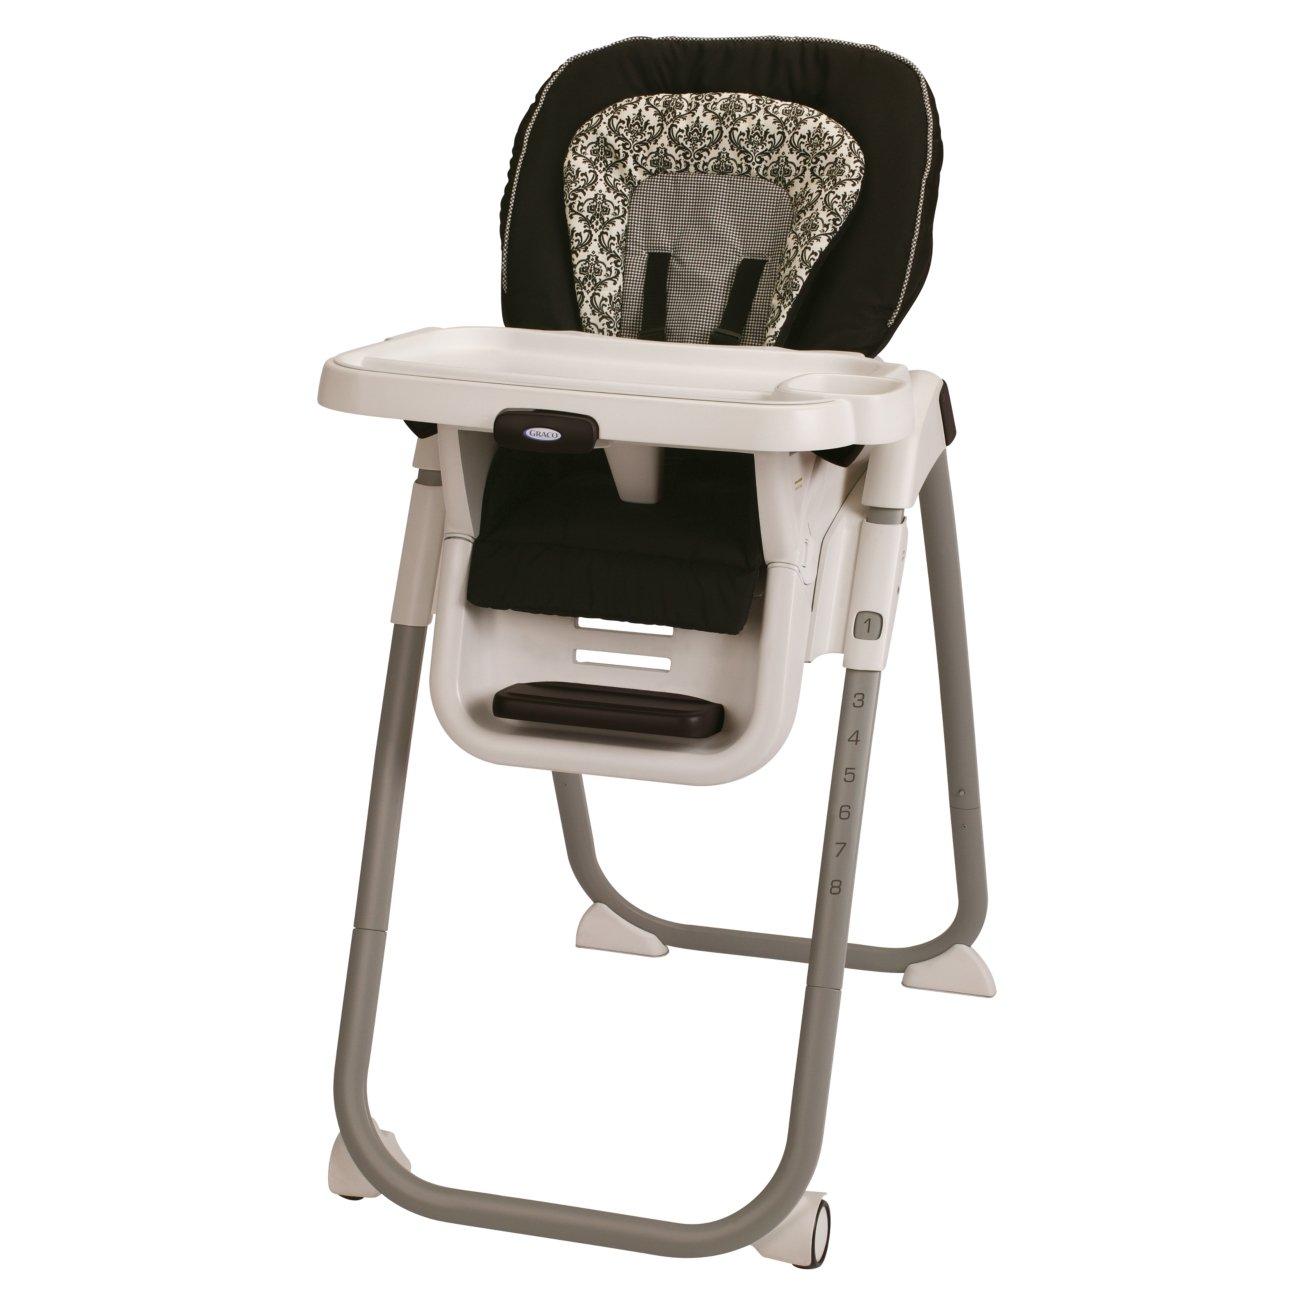 Graco TableFit Baby High Chair, Rittenhouse